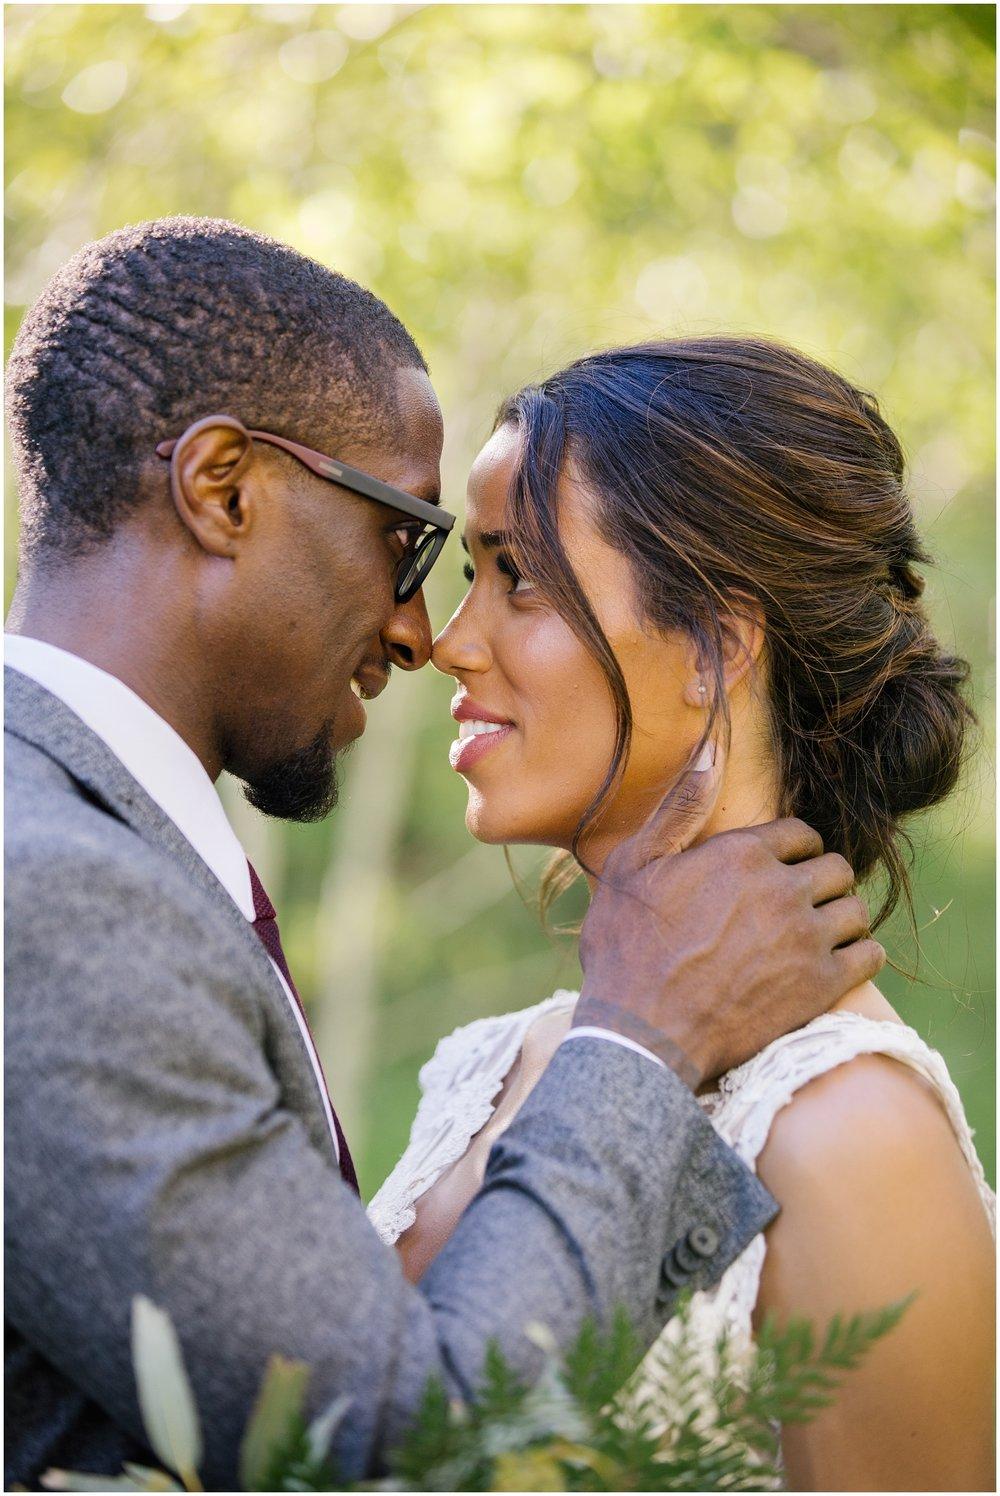 TreeHorseShoot-17_Lizzie-B-Imagery-Utah-Wedding-Photographer-Salt-Lake-City-Park-City-Oakley.jpg